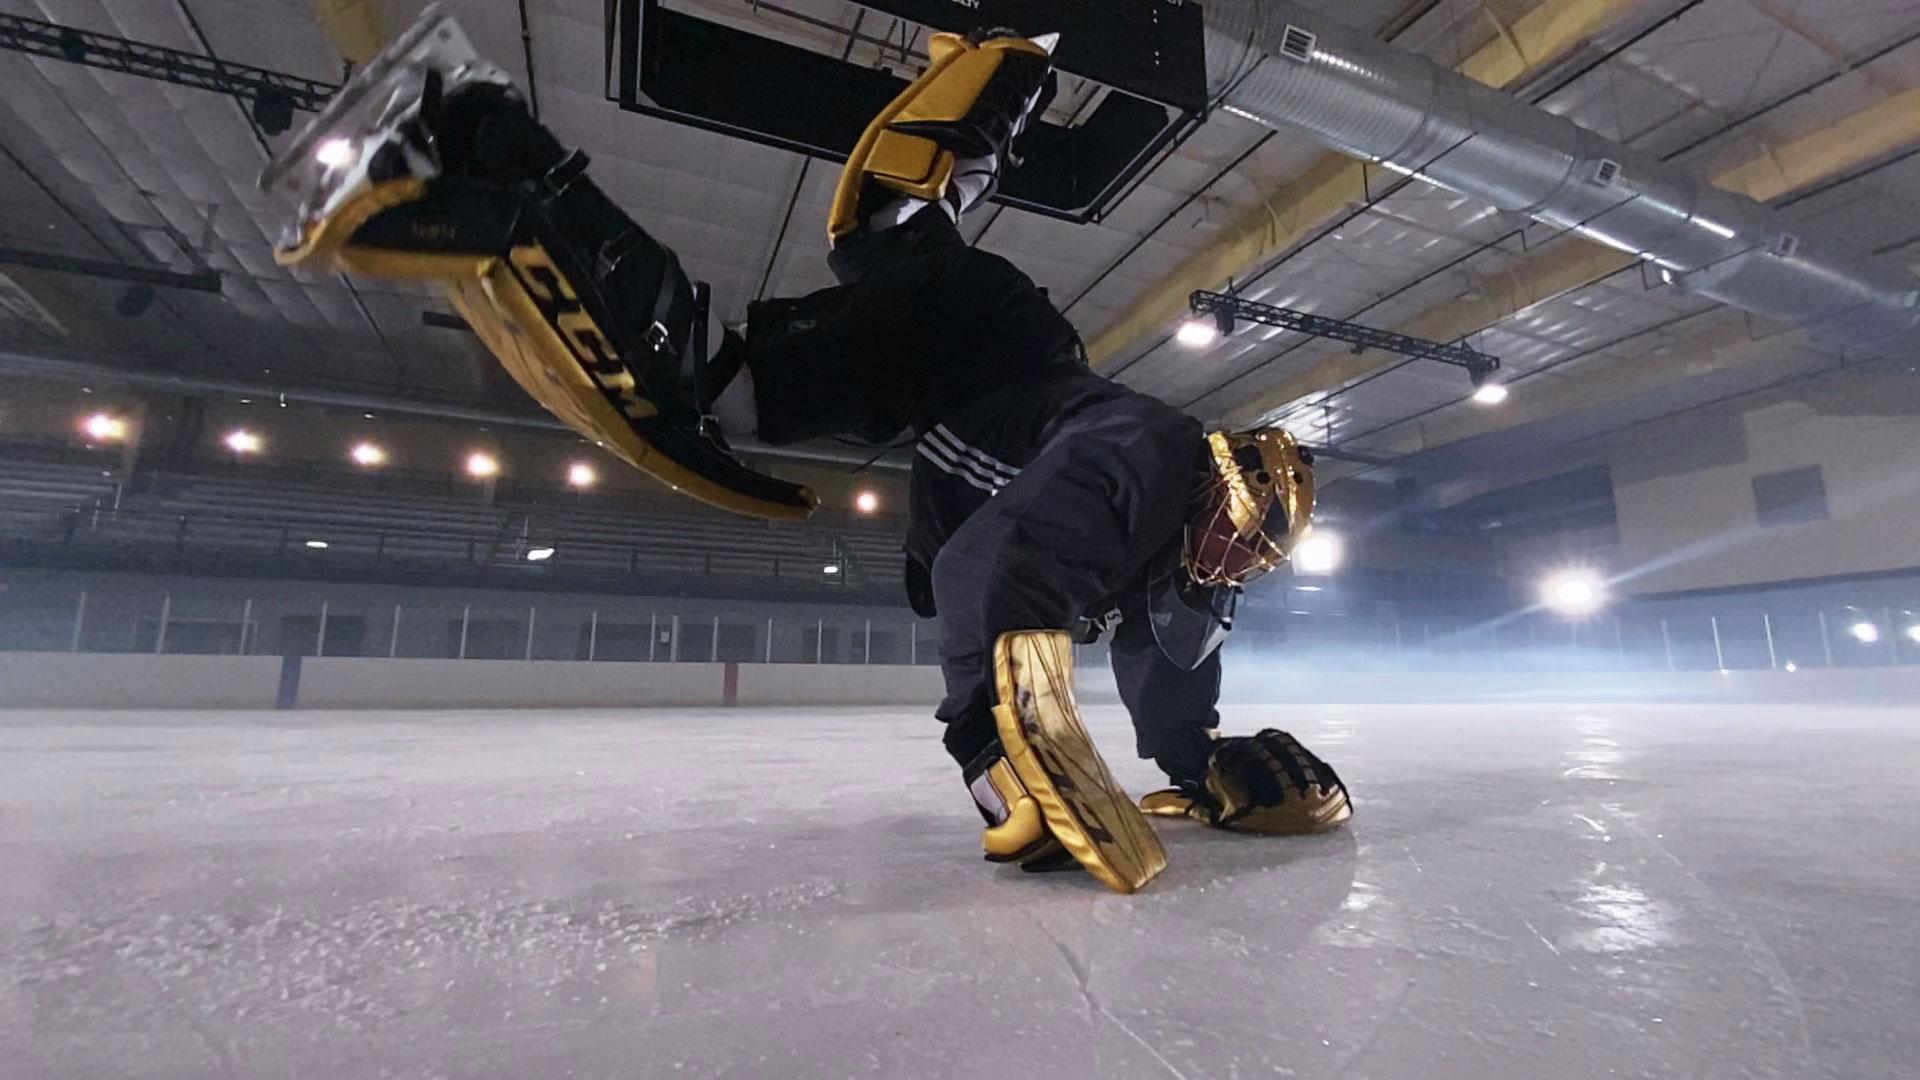 ice skating snowboarding skiing footwear snow sports equipment